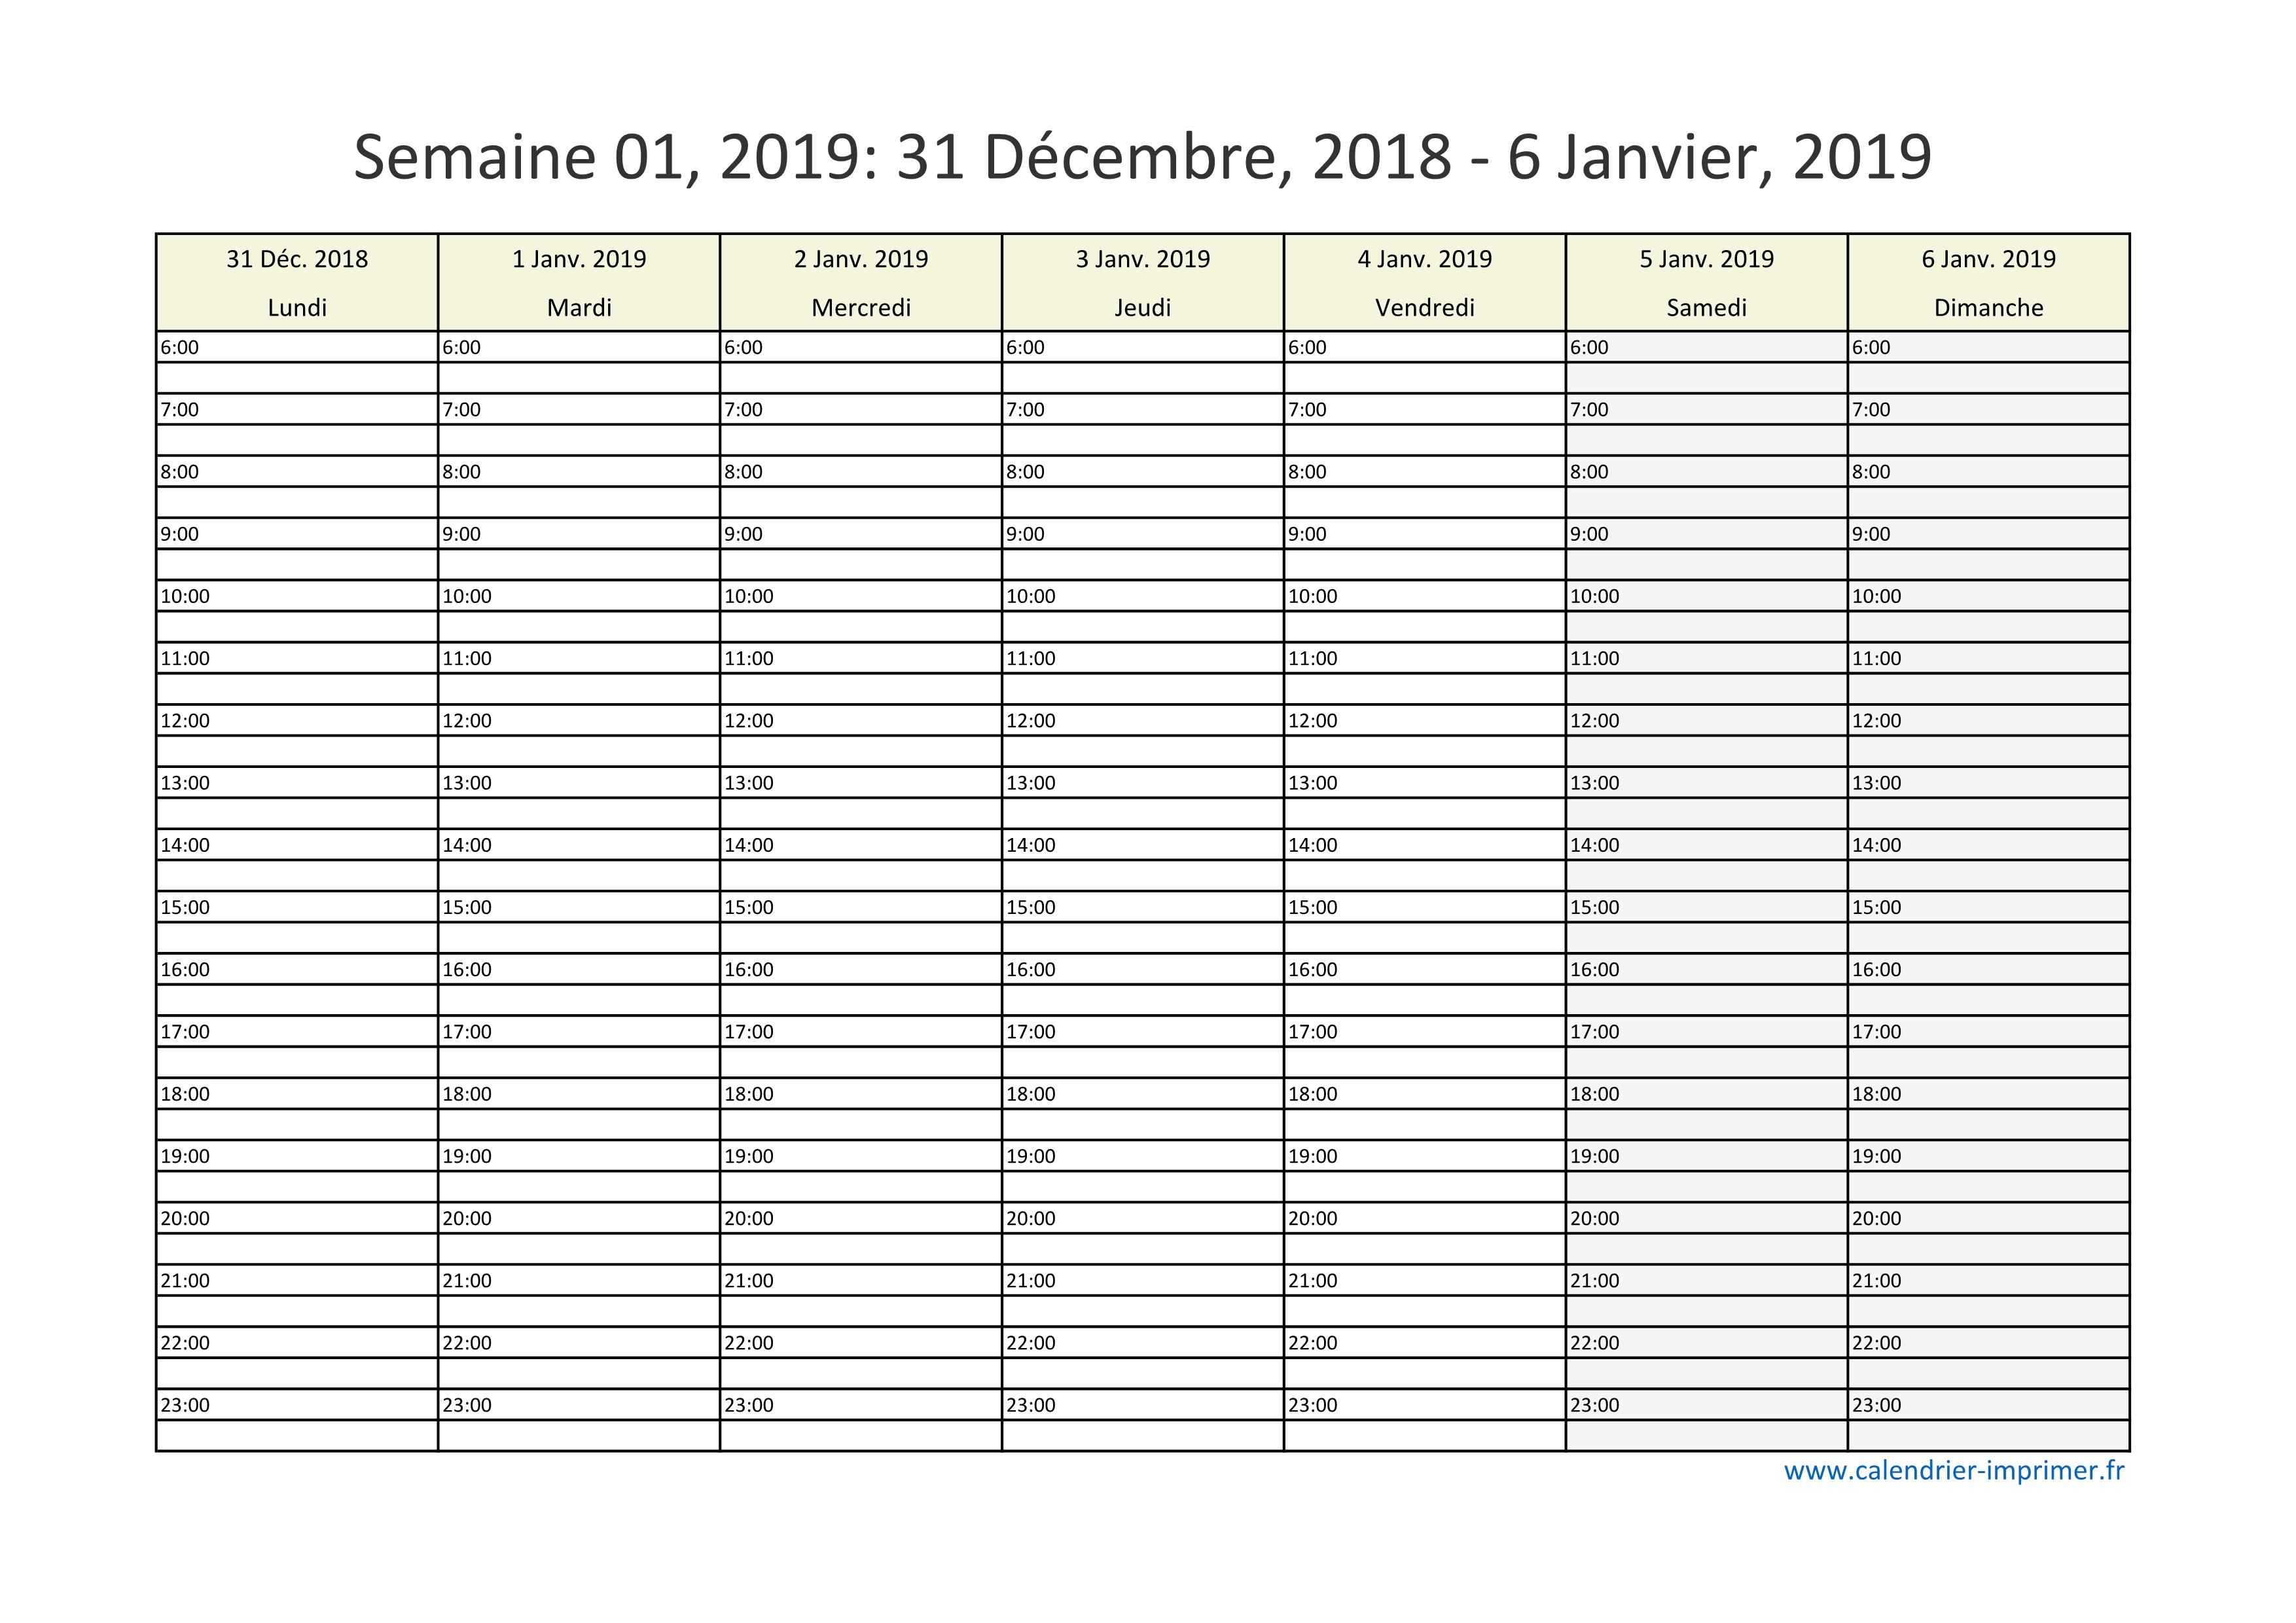 Semaine 2019 Calendrier.Calendrier 2019 Semaine Planning Hebdomadaire Semainier